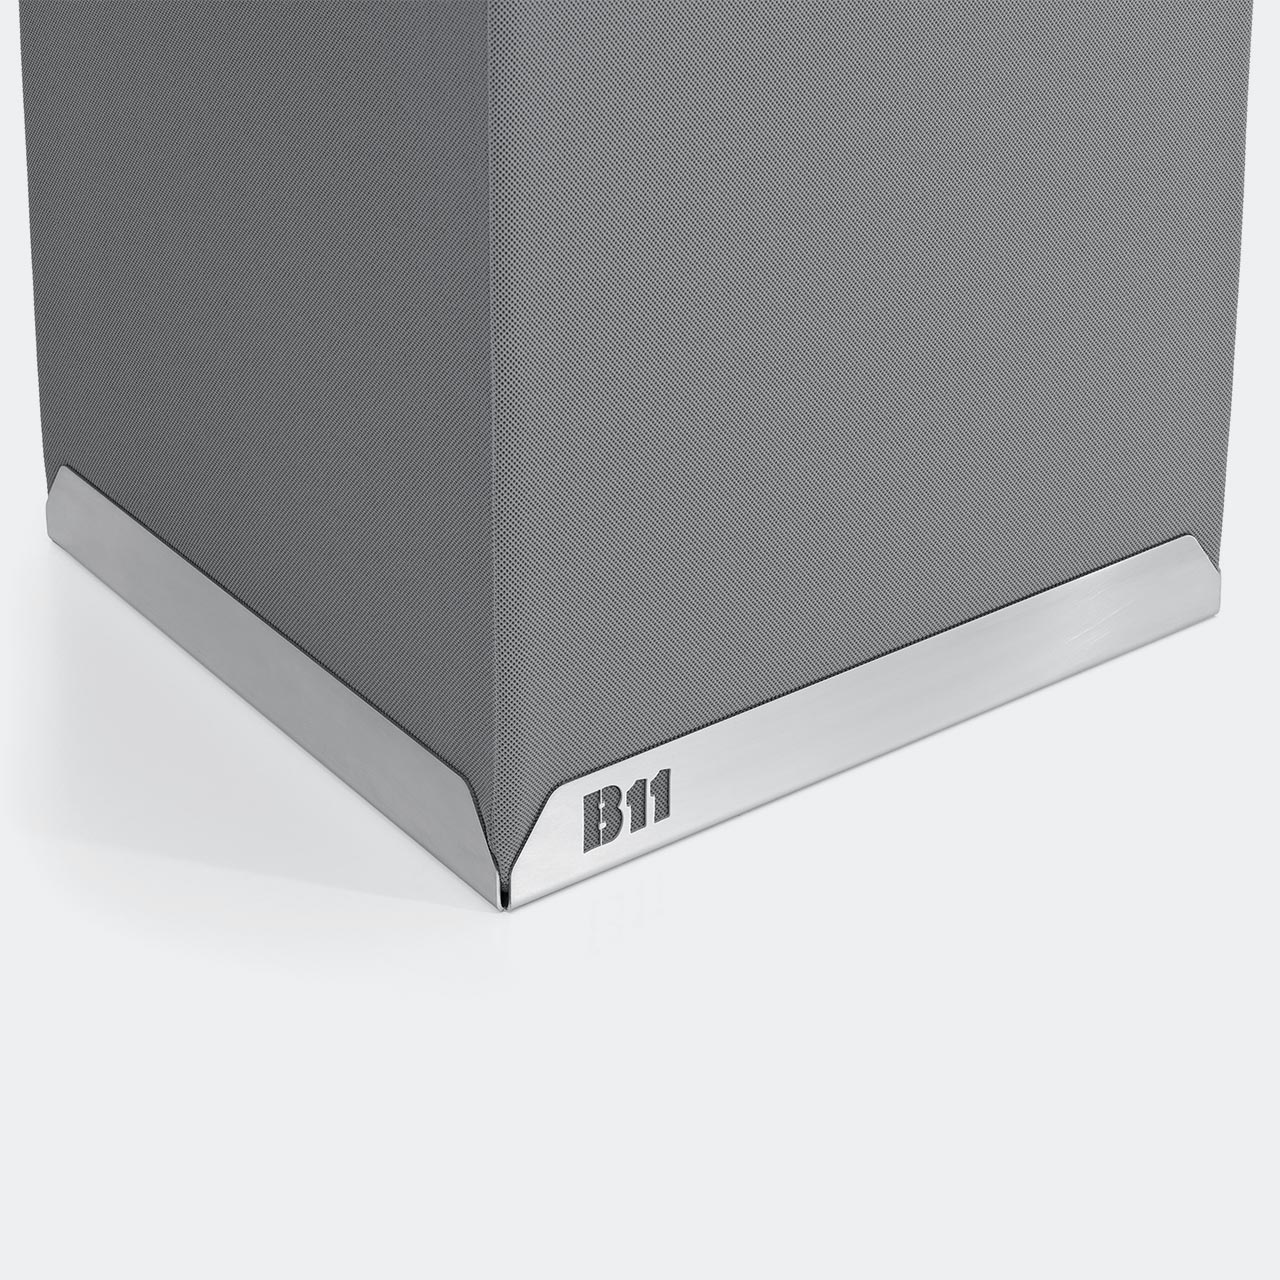 Akustiksaeule, Standabsorber, Akustikschaumstoff, Akustikelemente, Breitbandabsorber, Basotect, Schallabsorber, Schaumstoff Schallschutz, Raumakustik Absorber